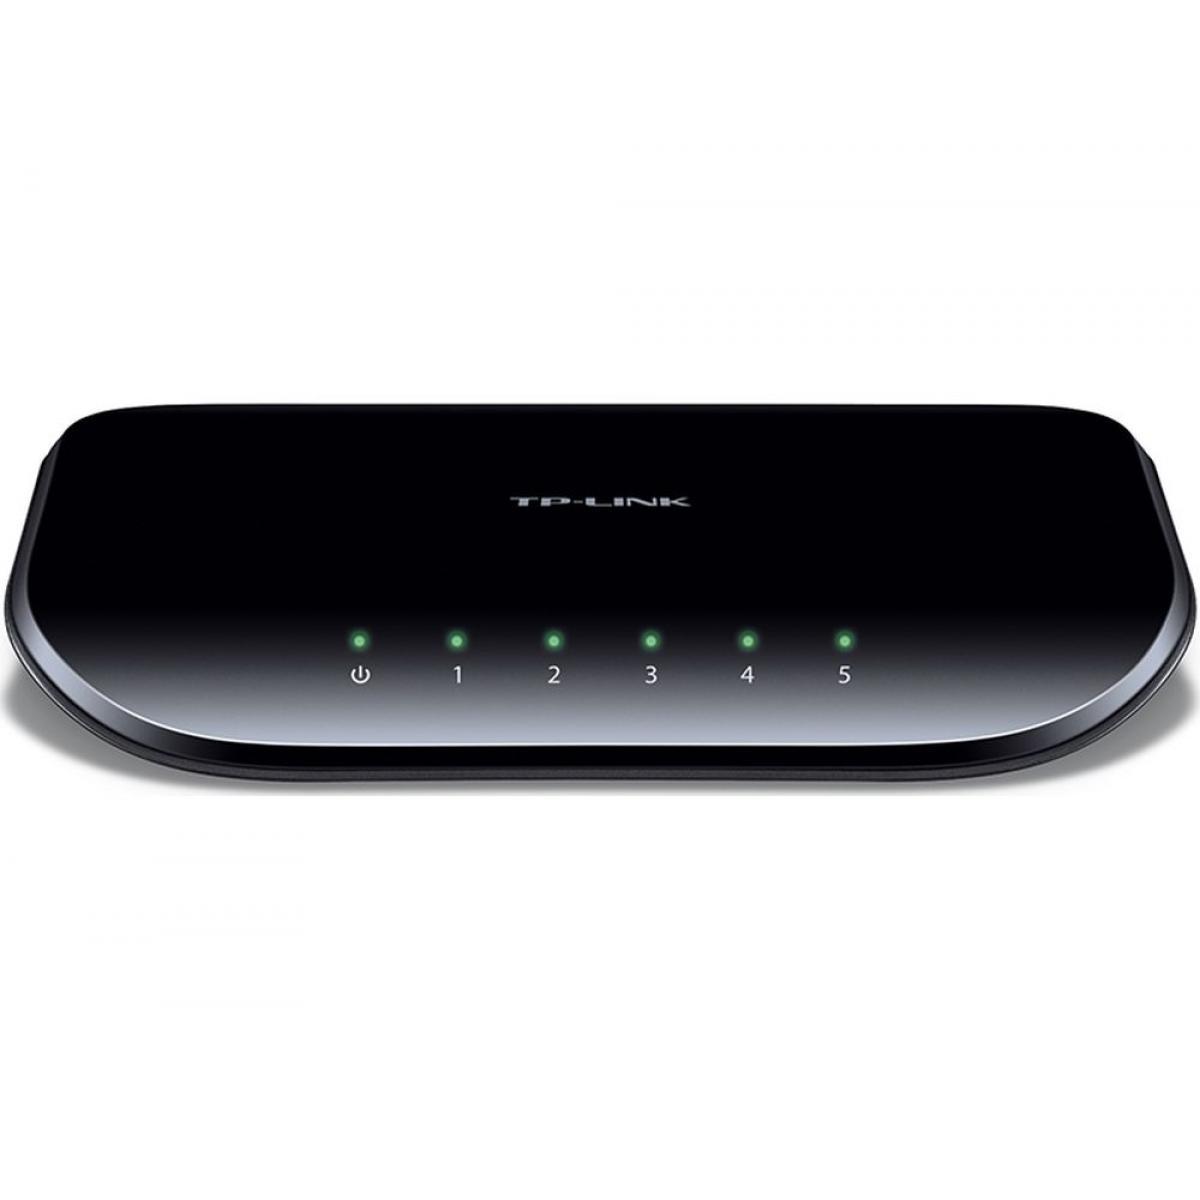 Tp Link Desktop Switch 5 Port Gigabit Tl Sg1005d Gts Amman Jordan 10 100 1000 Mbps Sg1024d 24